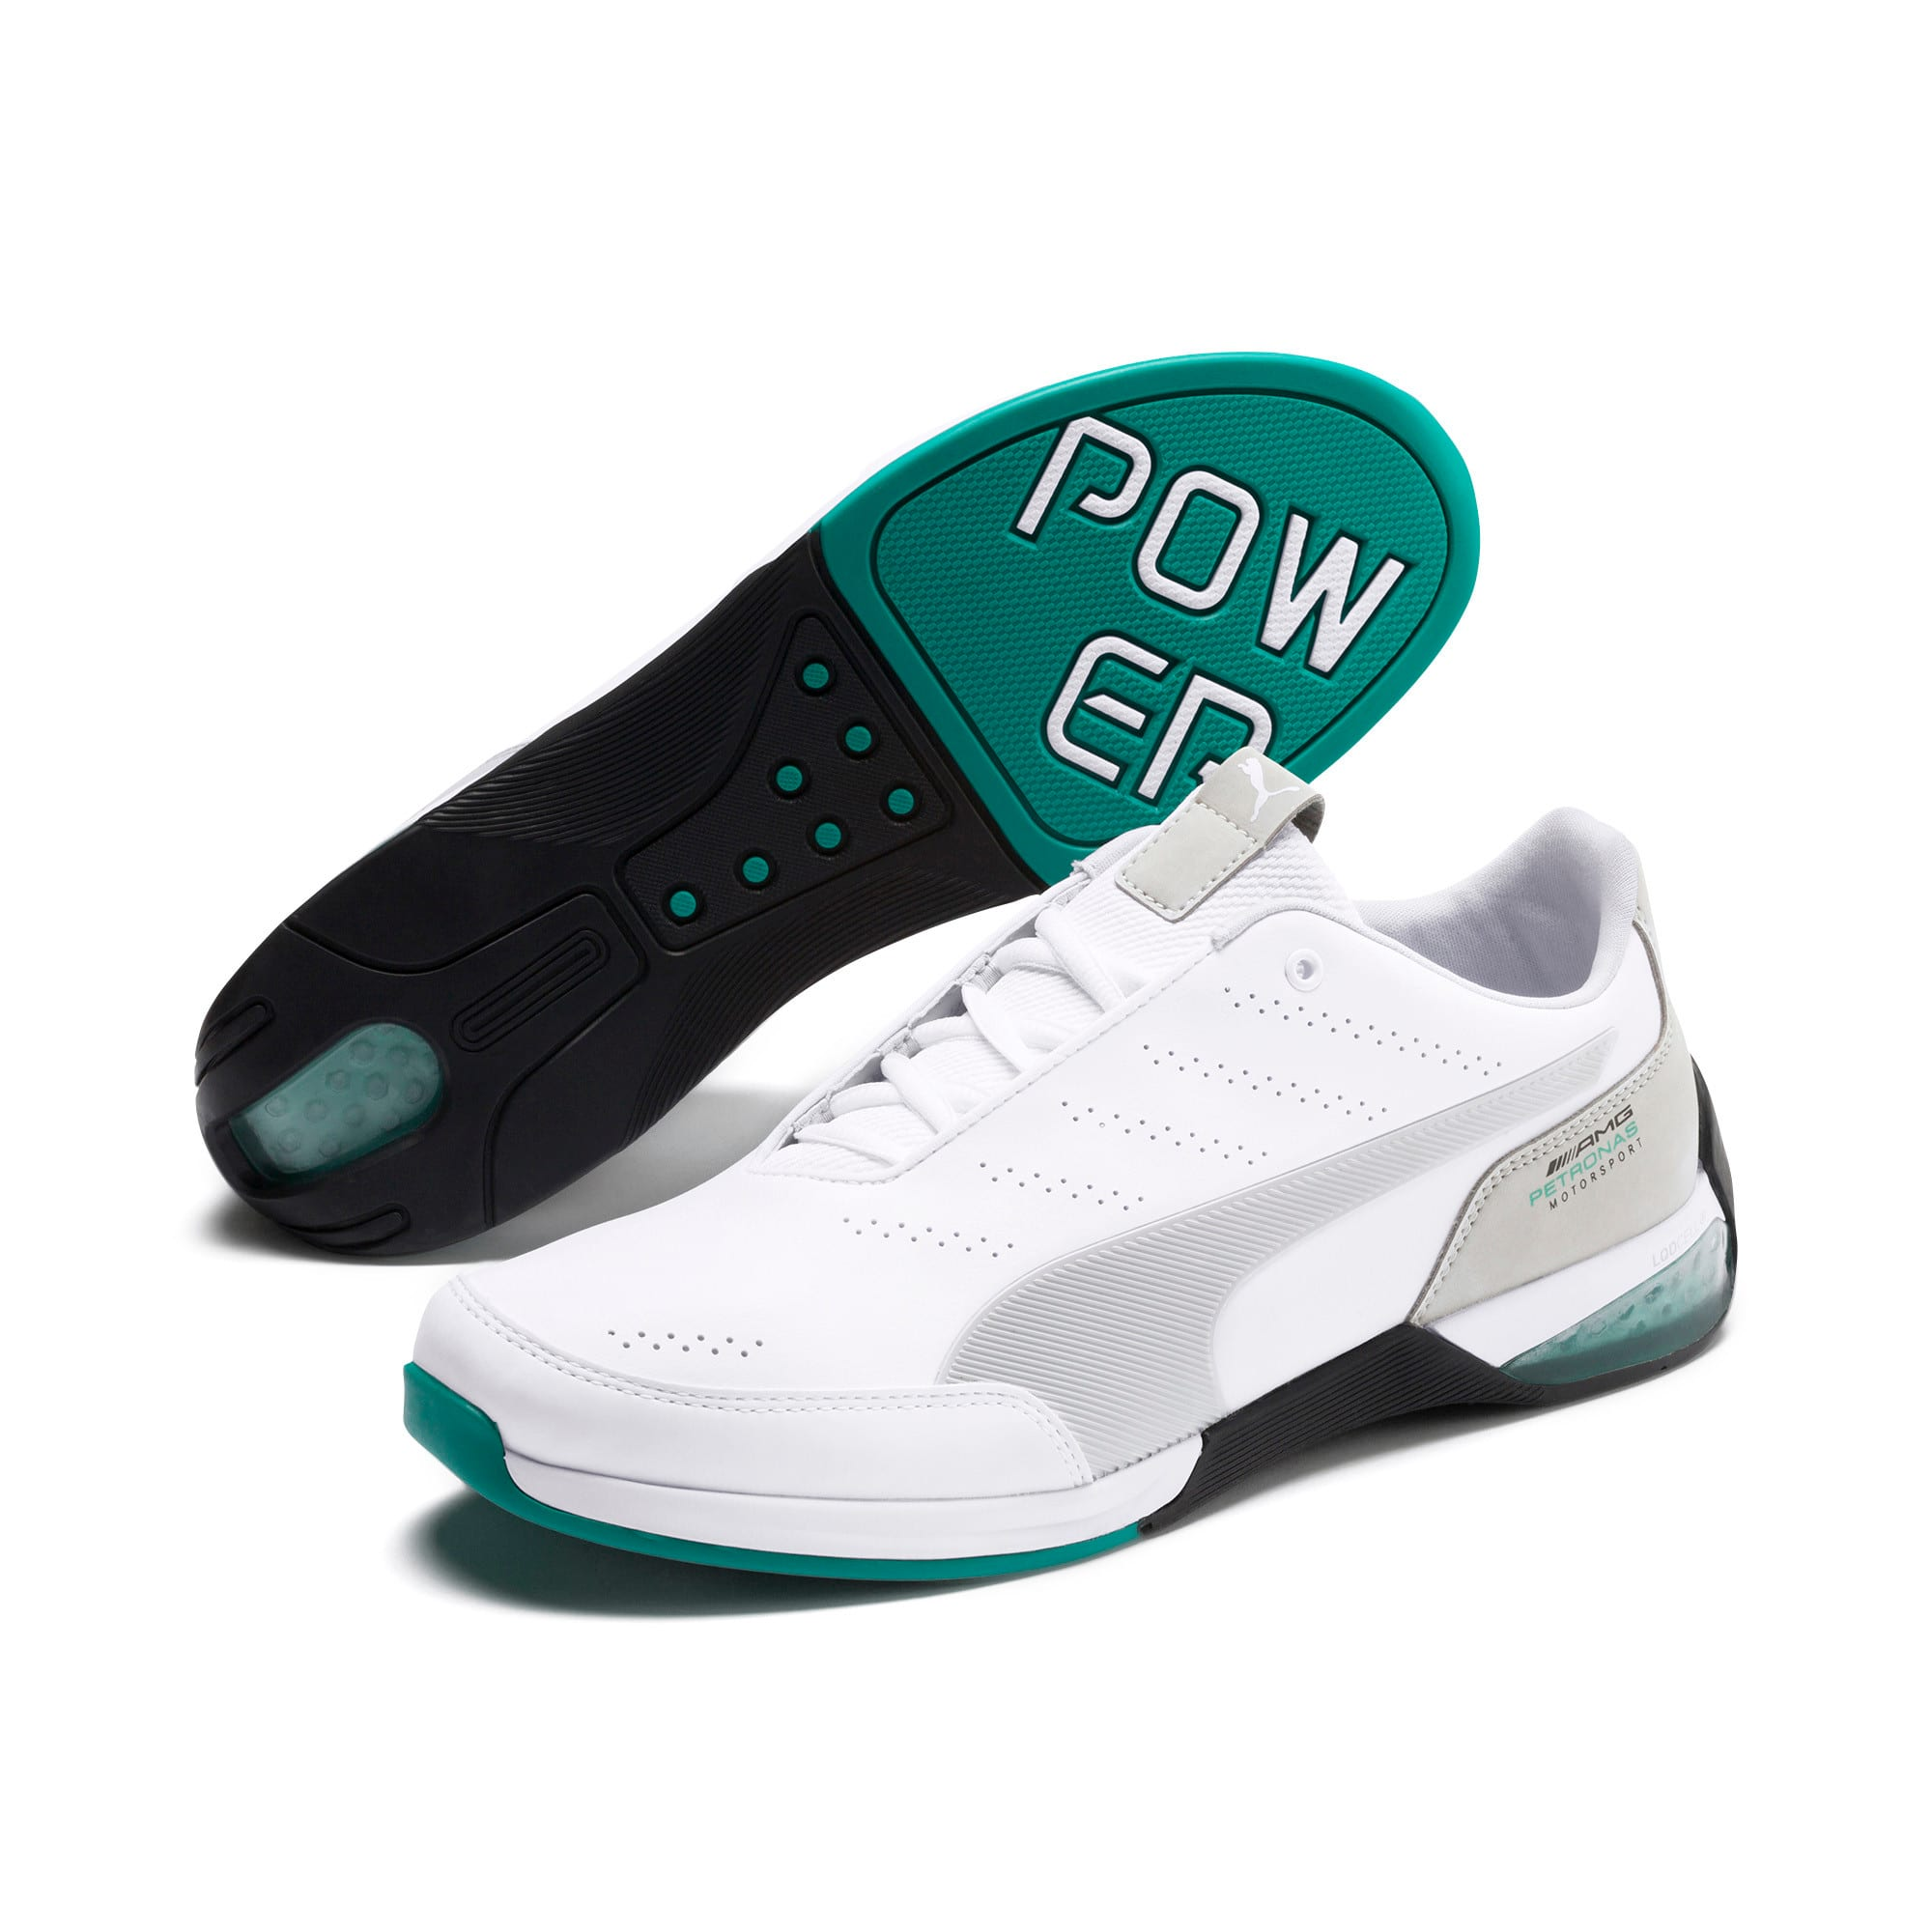 Thumbnail 3 of Mercedes AMG Petronas Kart Cat X Men's Training Shoes, Puma White-Mercedes Silver, medium